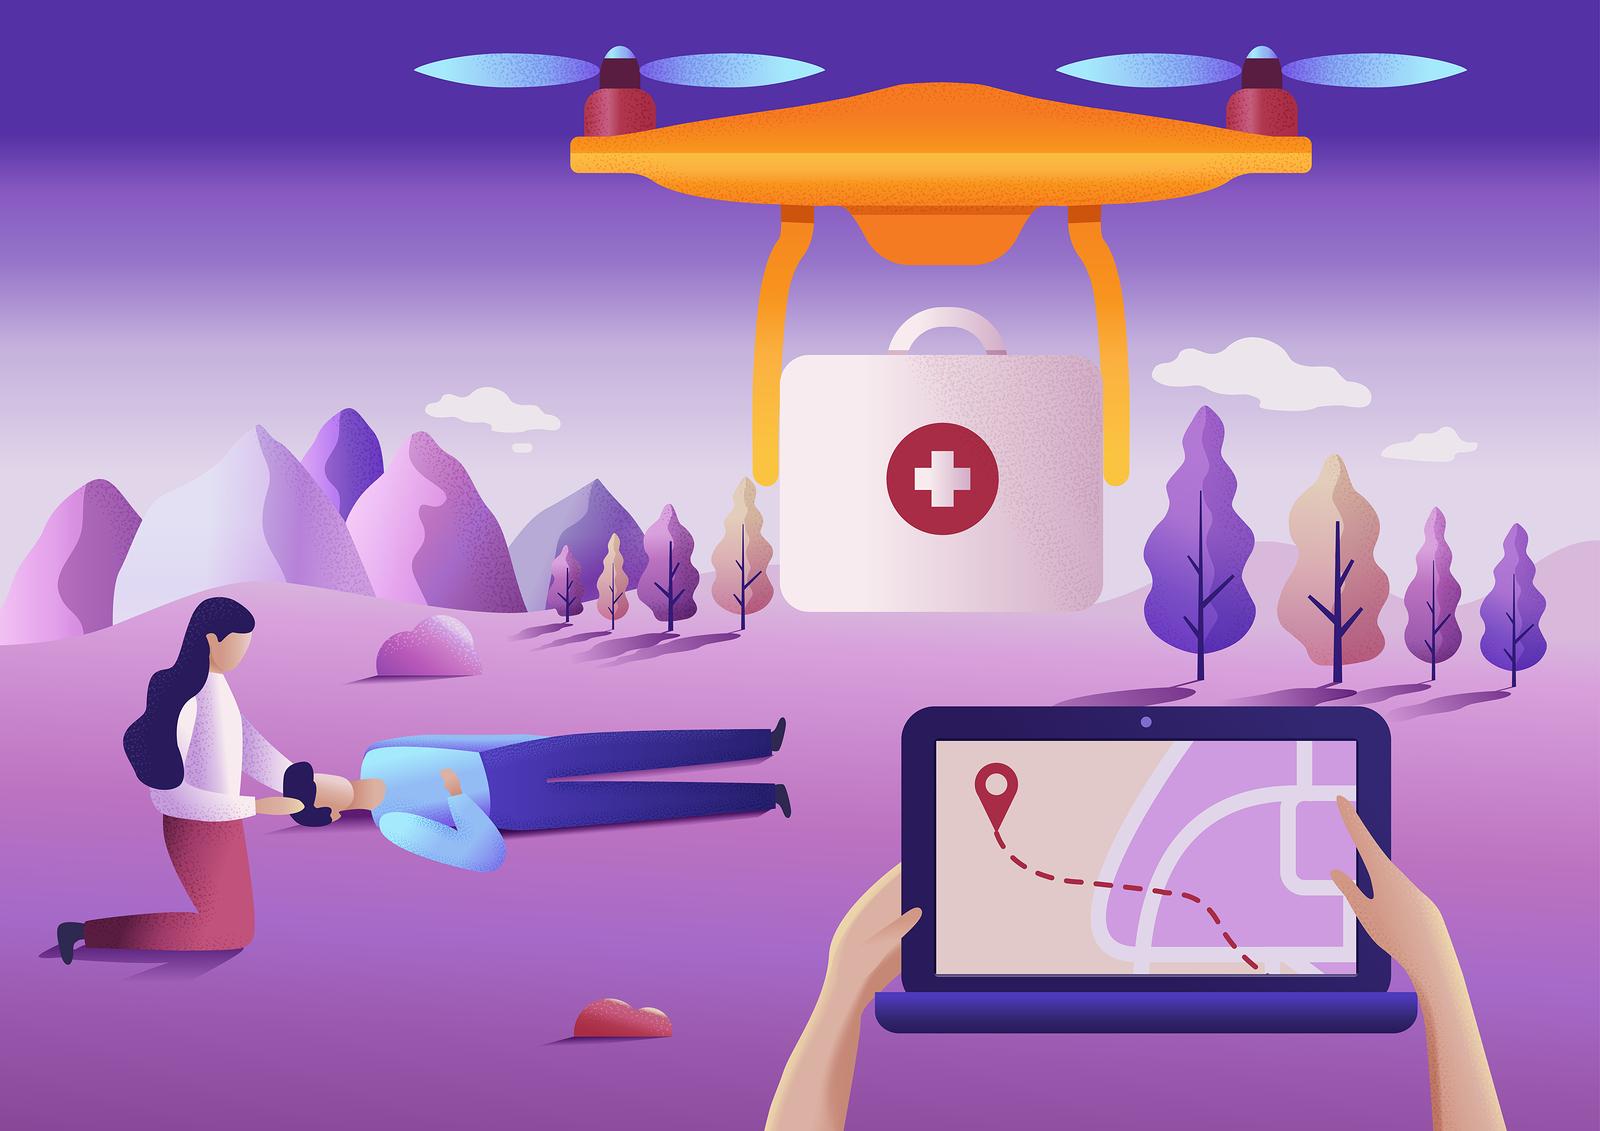 bigstock-Drone-Or-Quadcopter-Medical-Se-271827739.jpg